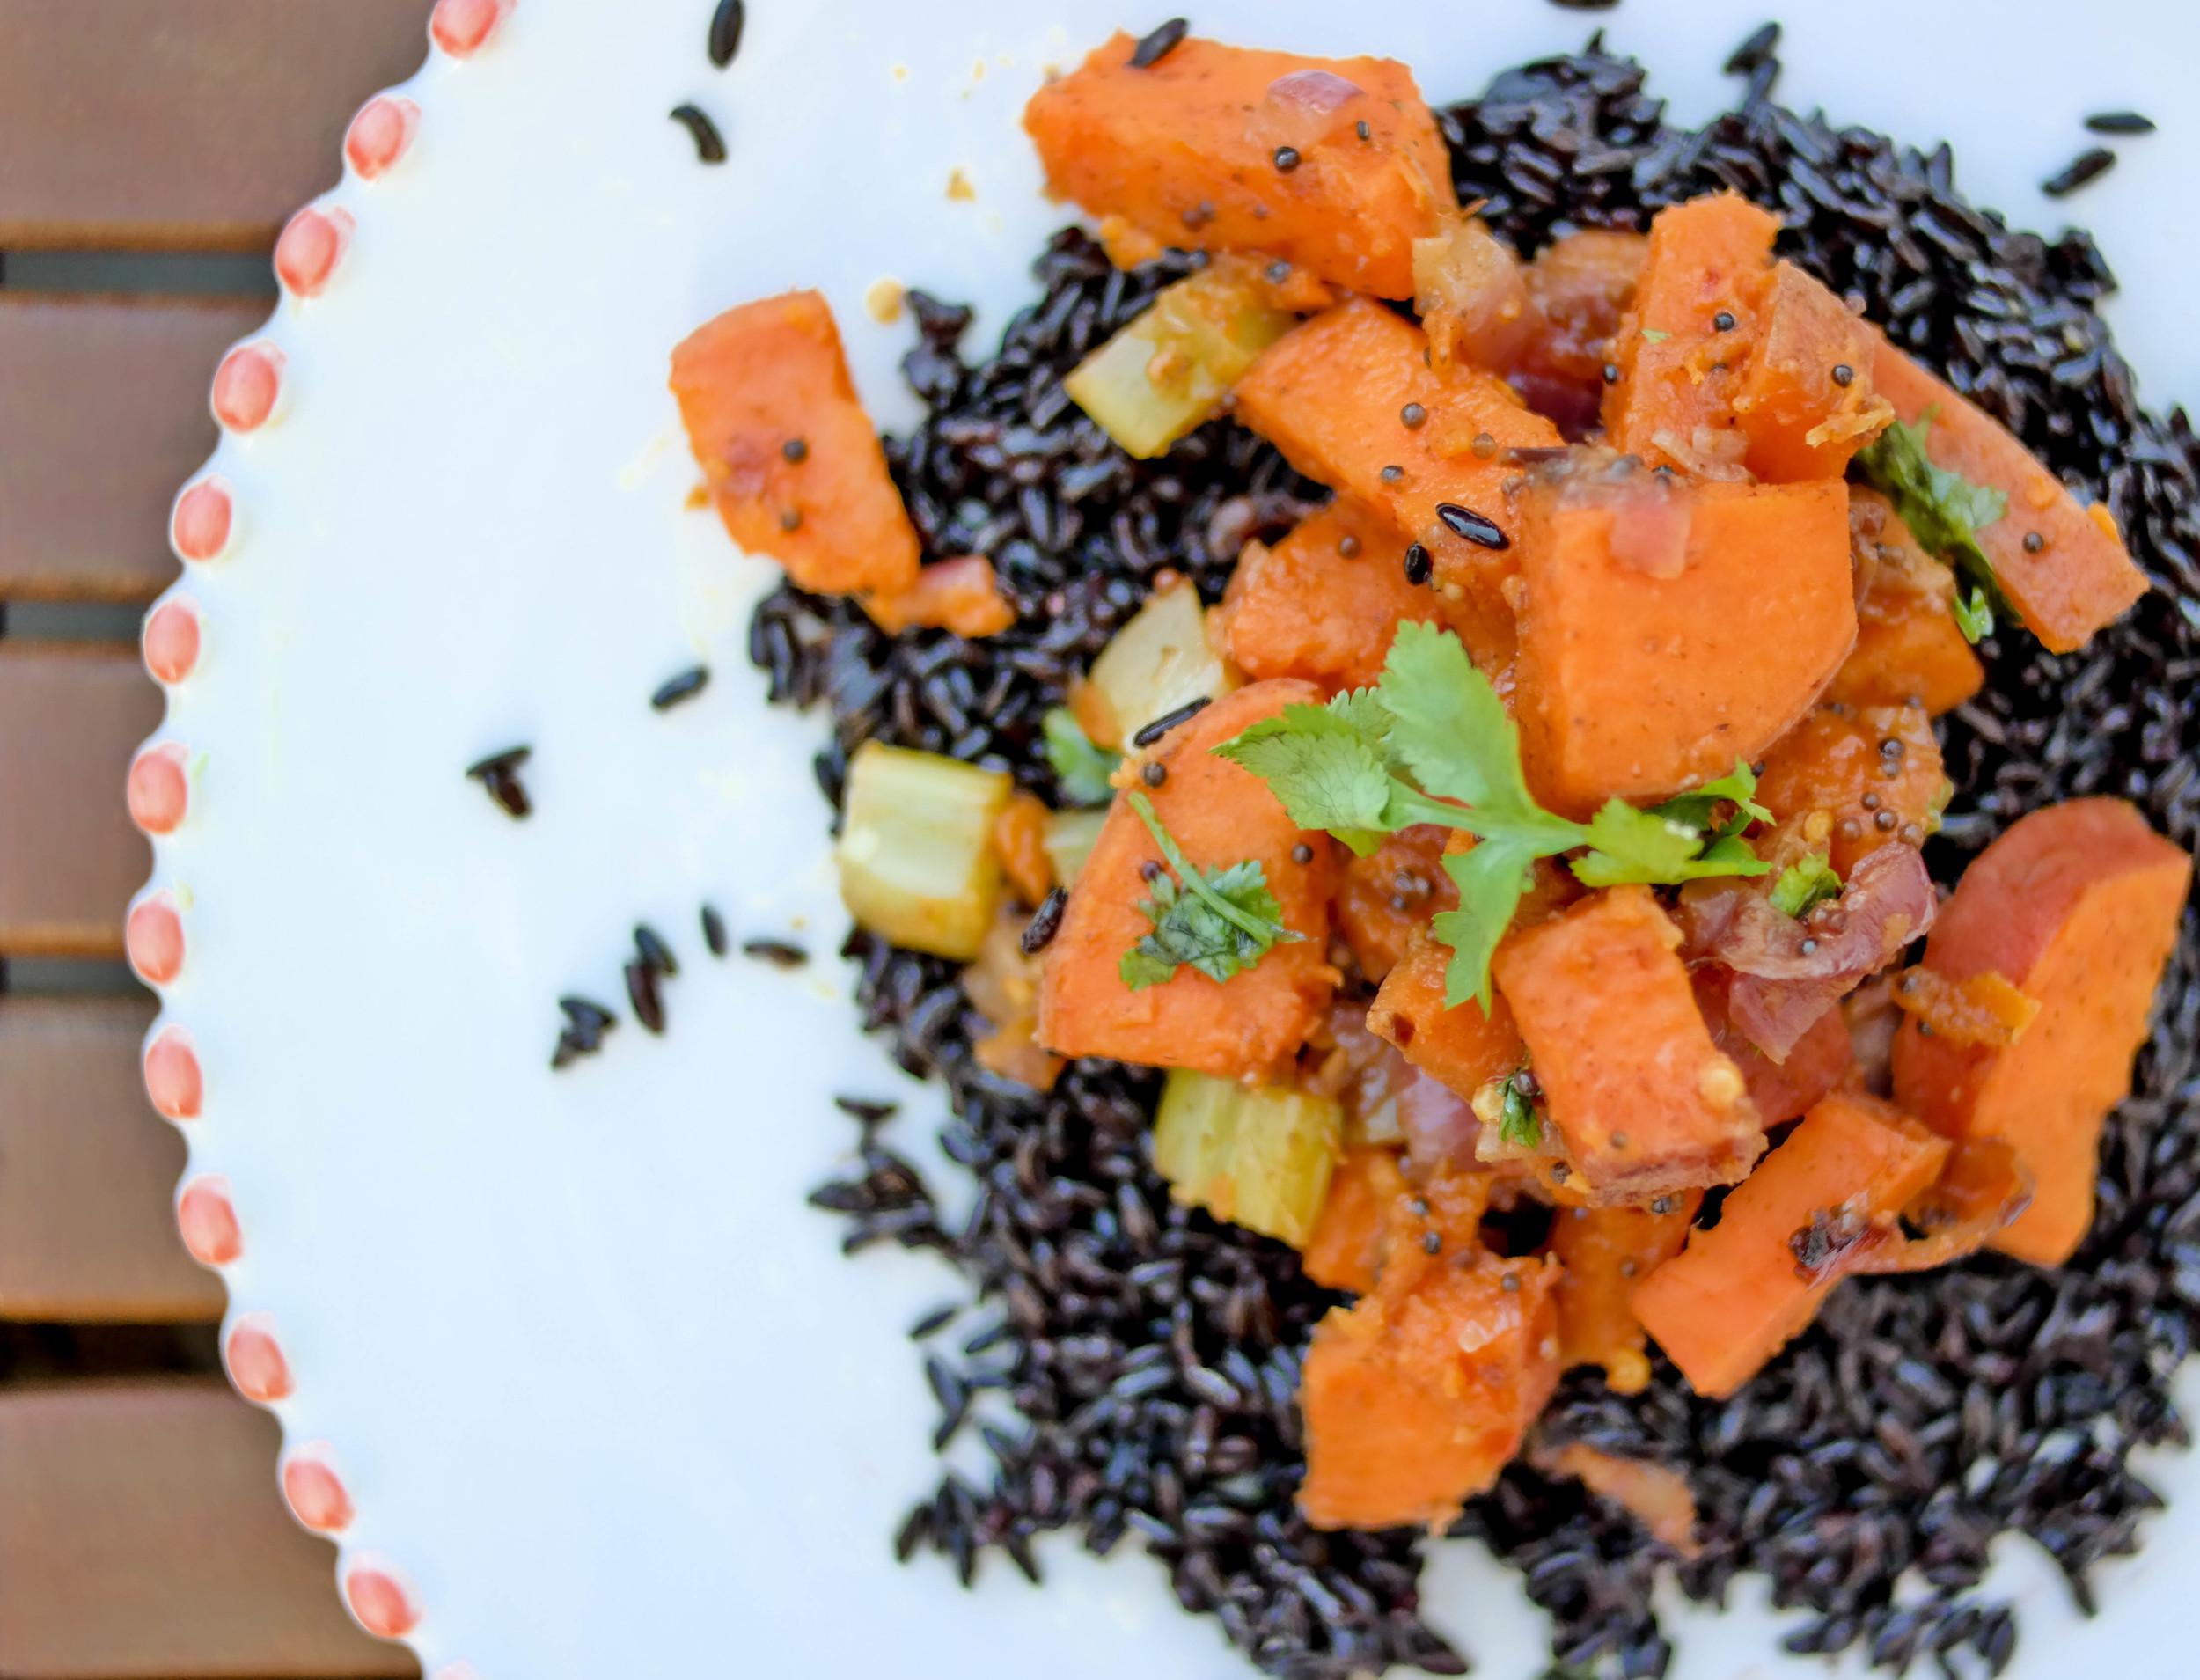 2-Spicy-Sweet-Potato-Bowl-with-Black-Rice | www.8thandlake.com